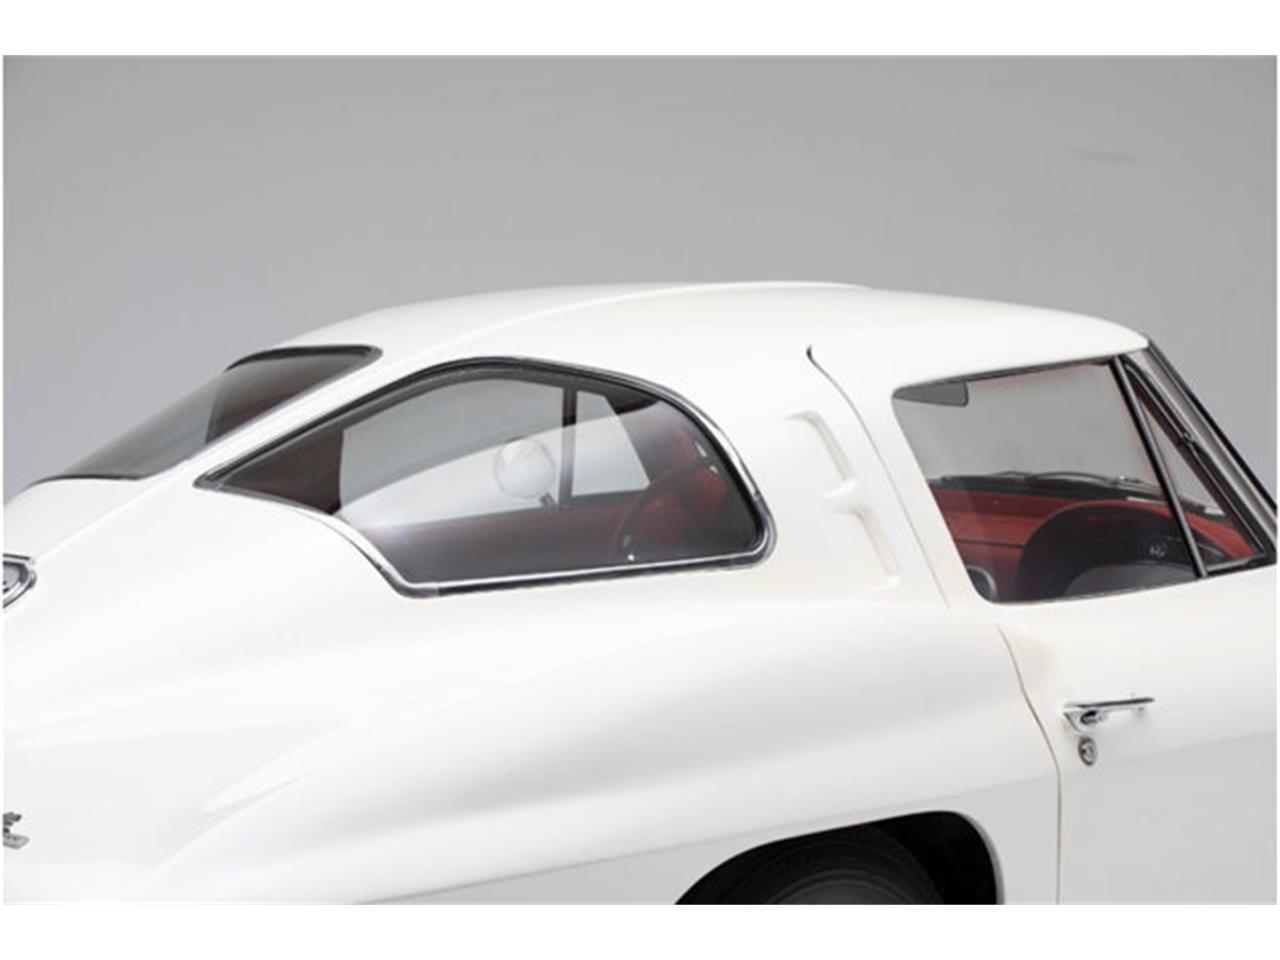 Large Picture of Classic '63 Corvette located in New York - QOXV